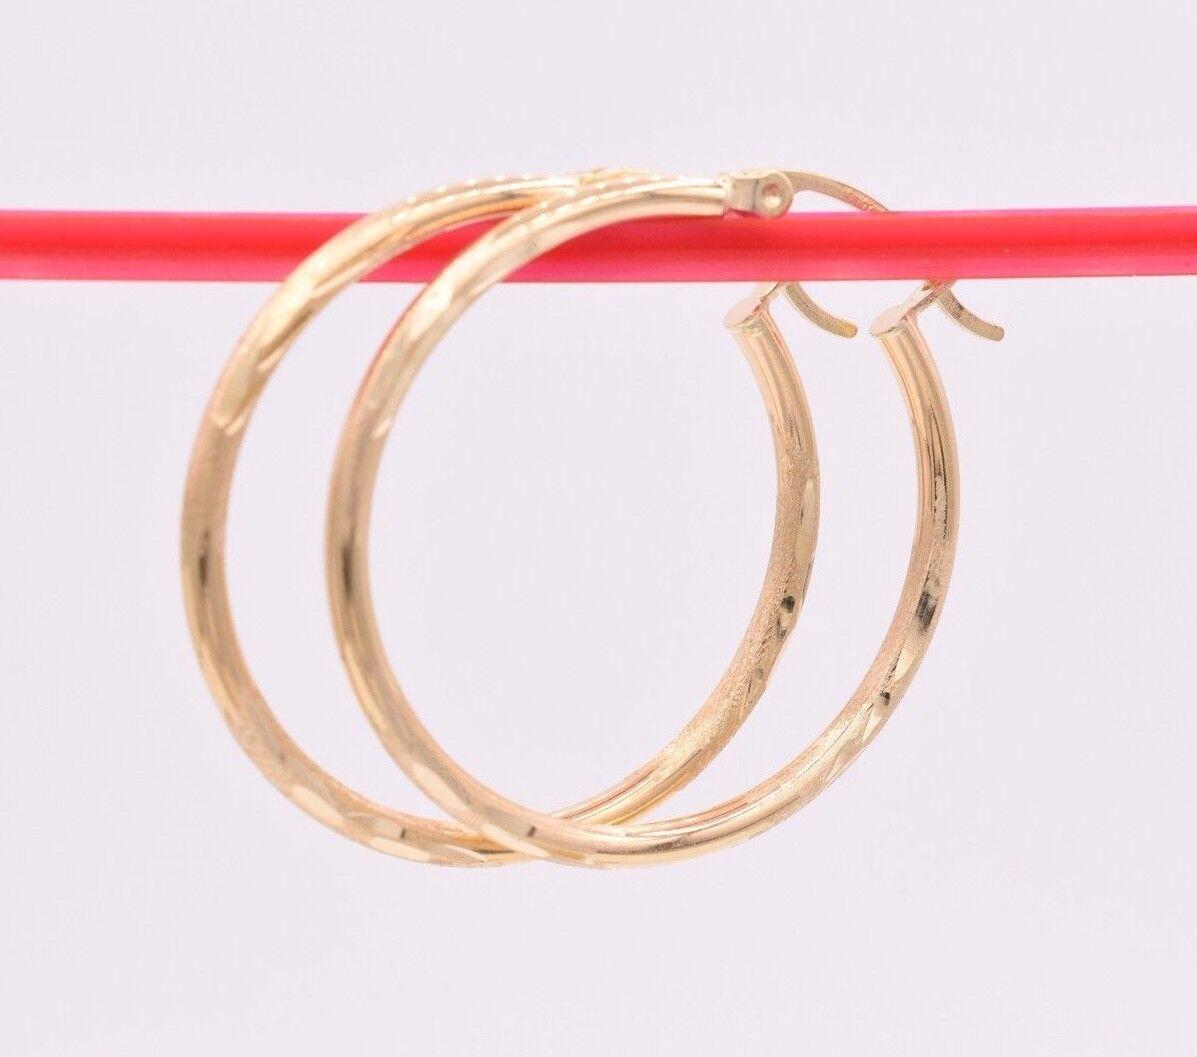 1 1 4  2mm X 30mm Large Diamond Cut Shiny Hoop Earrings REAL 14K Yellow gold